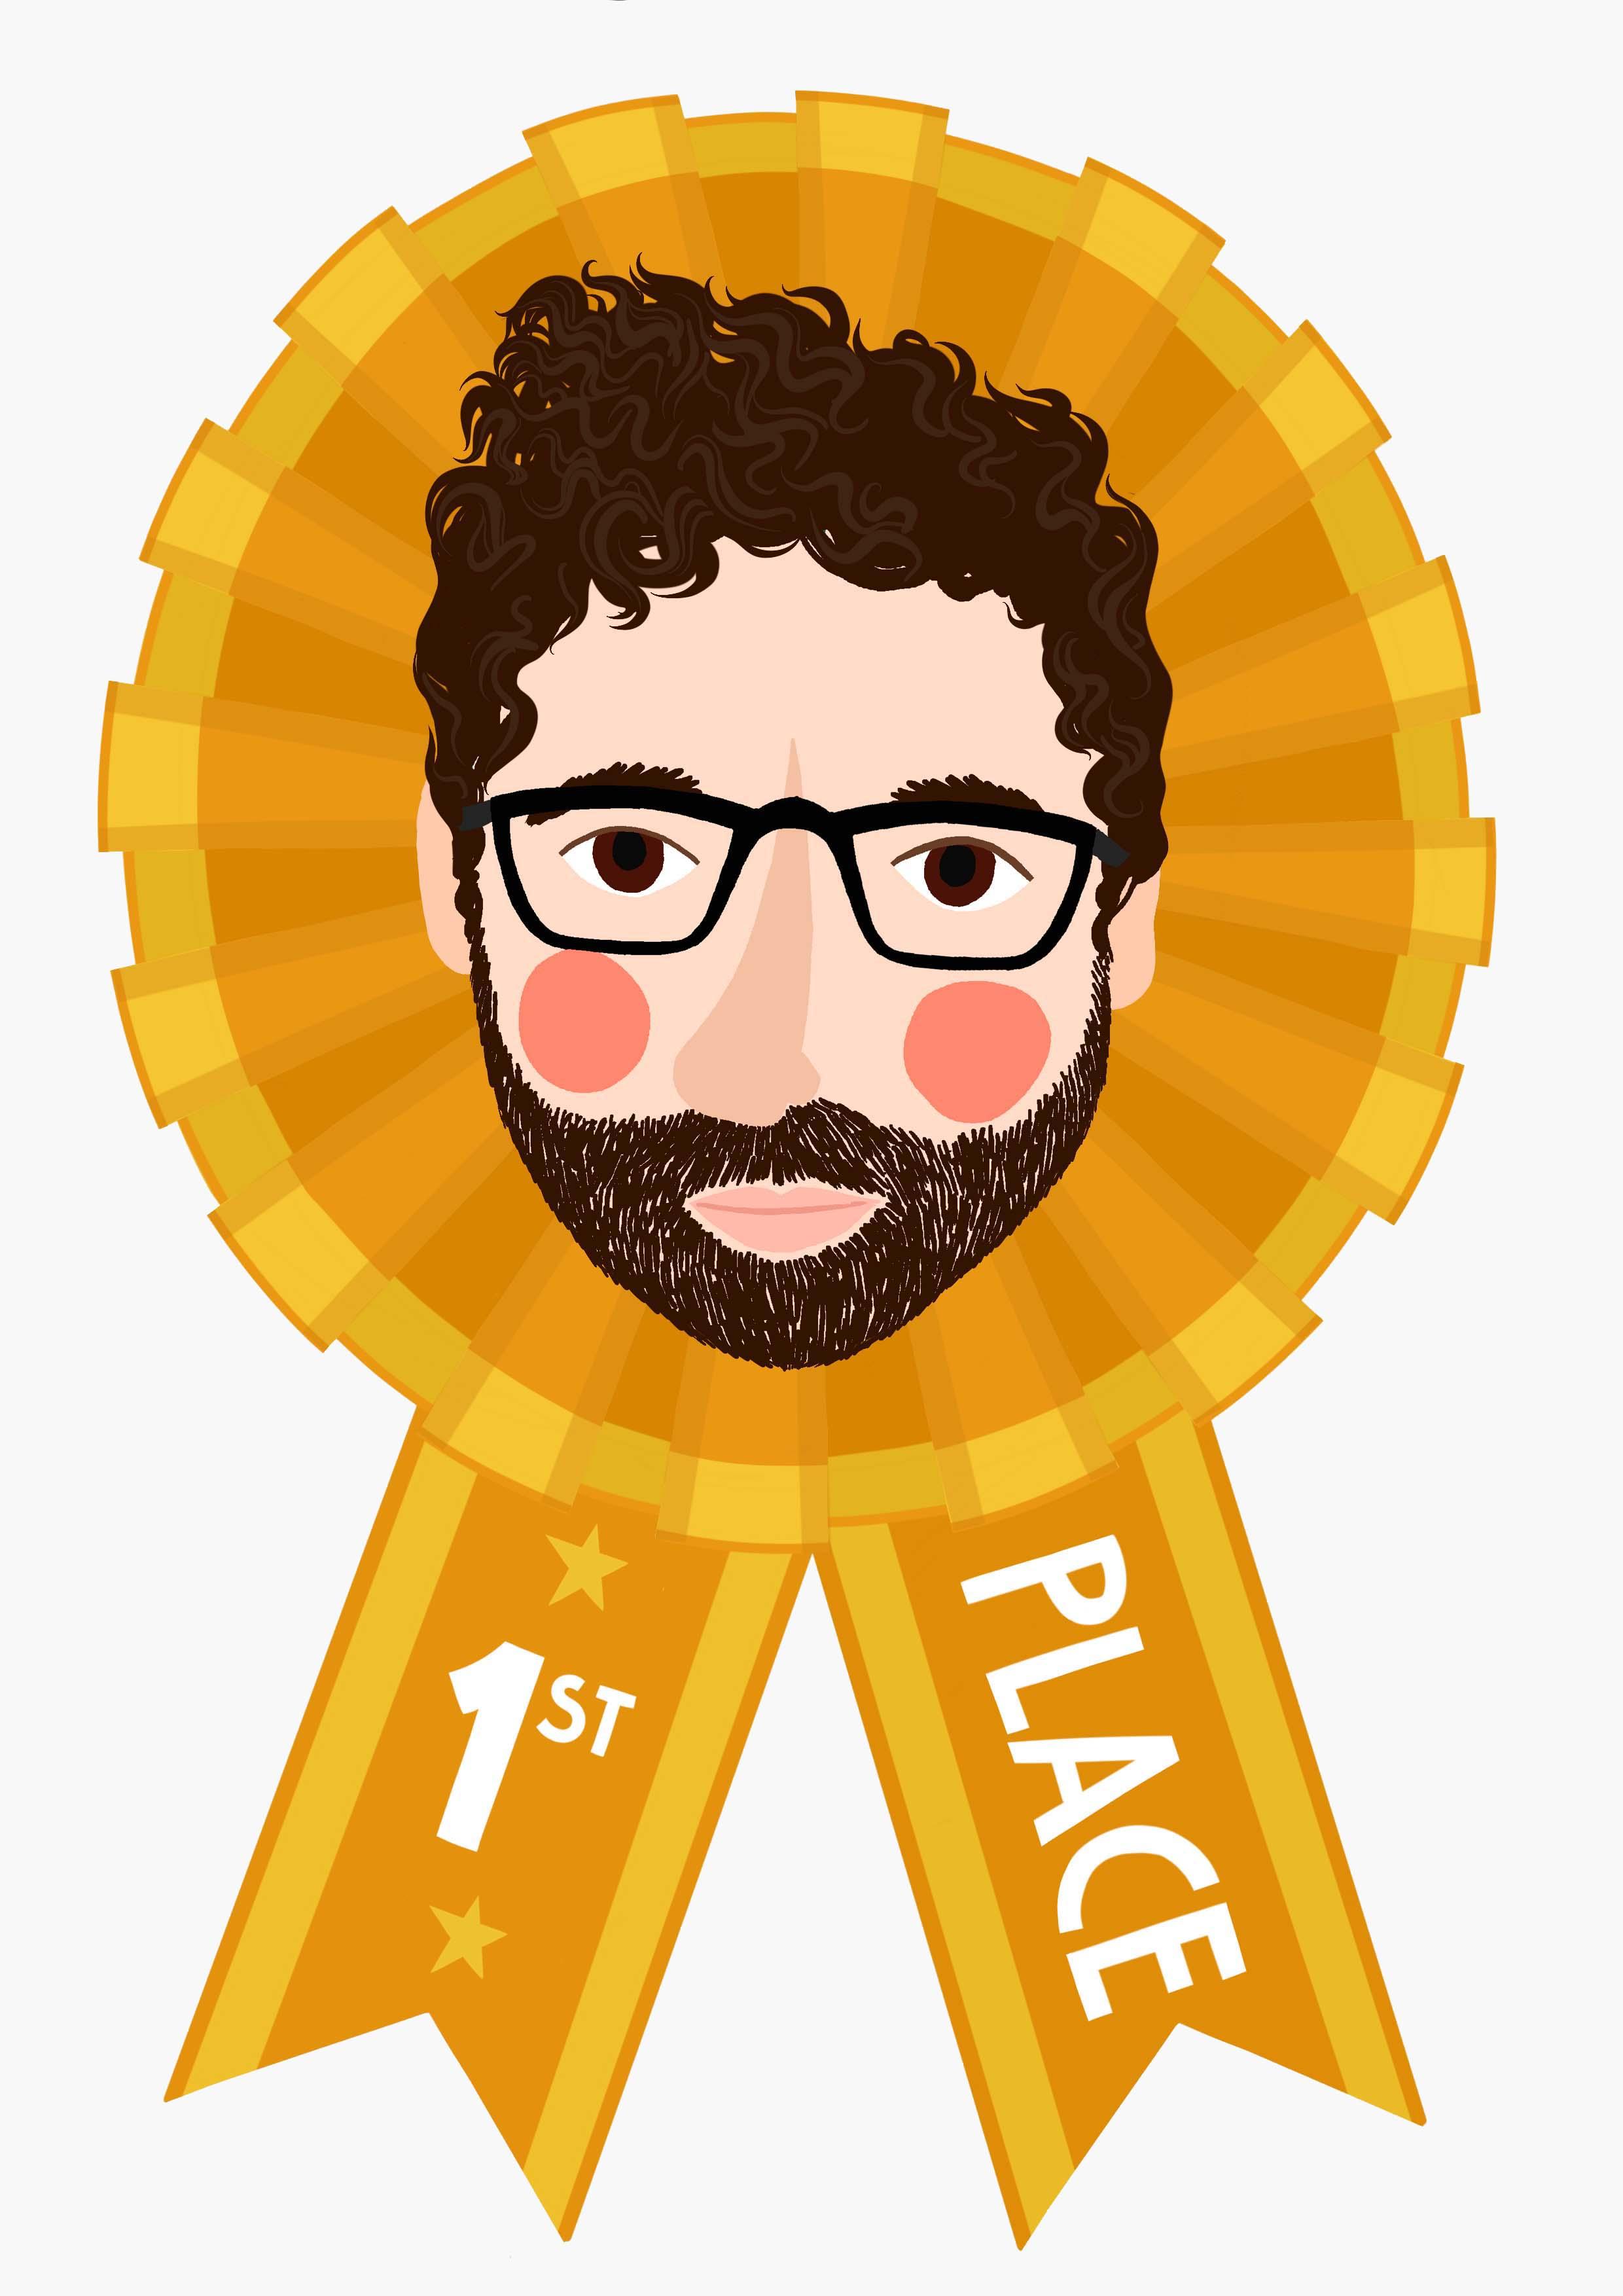 1st Place.jpg